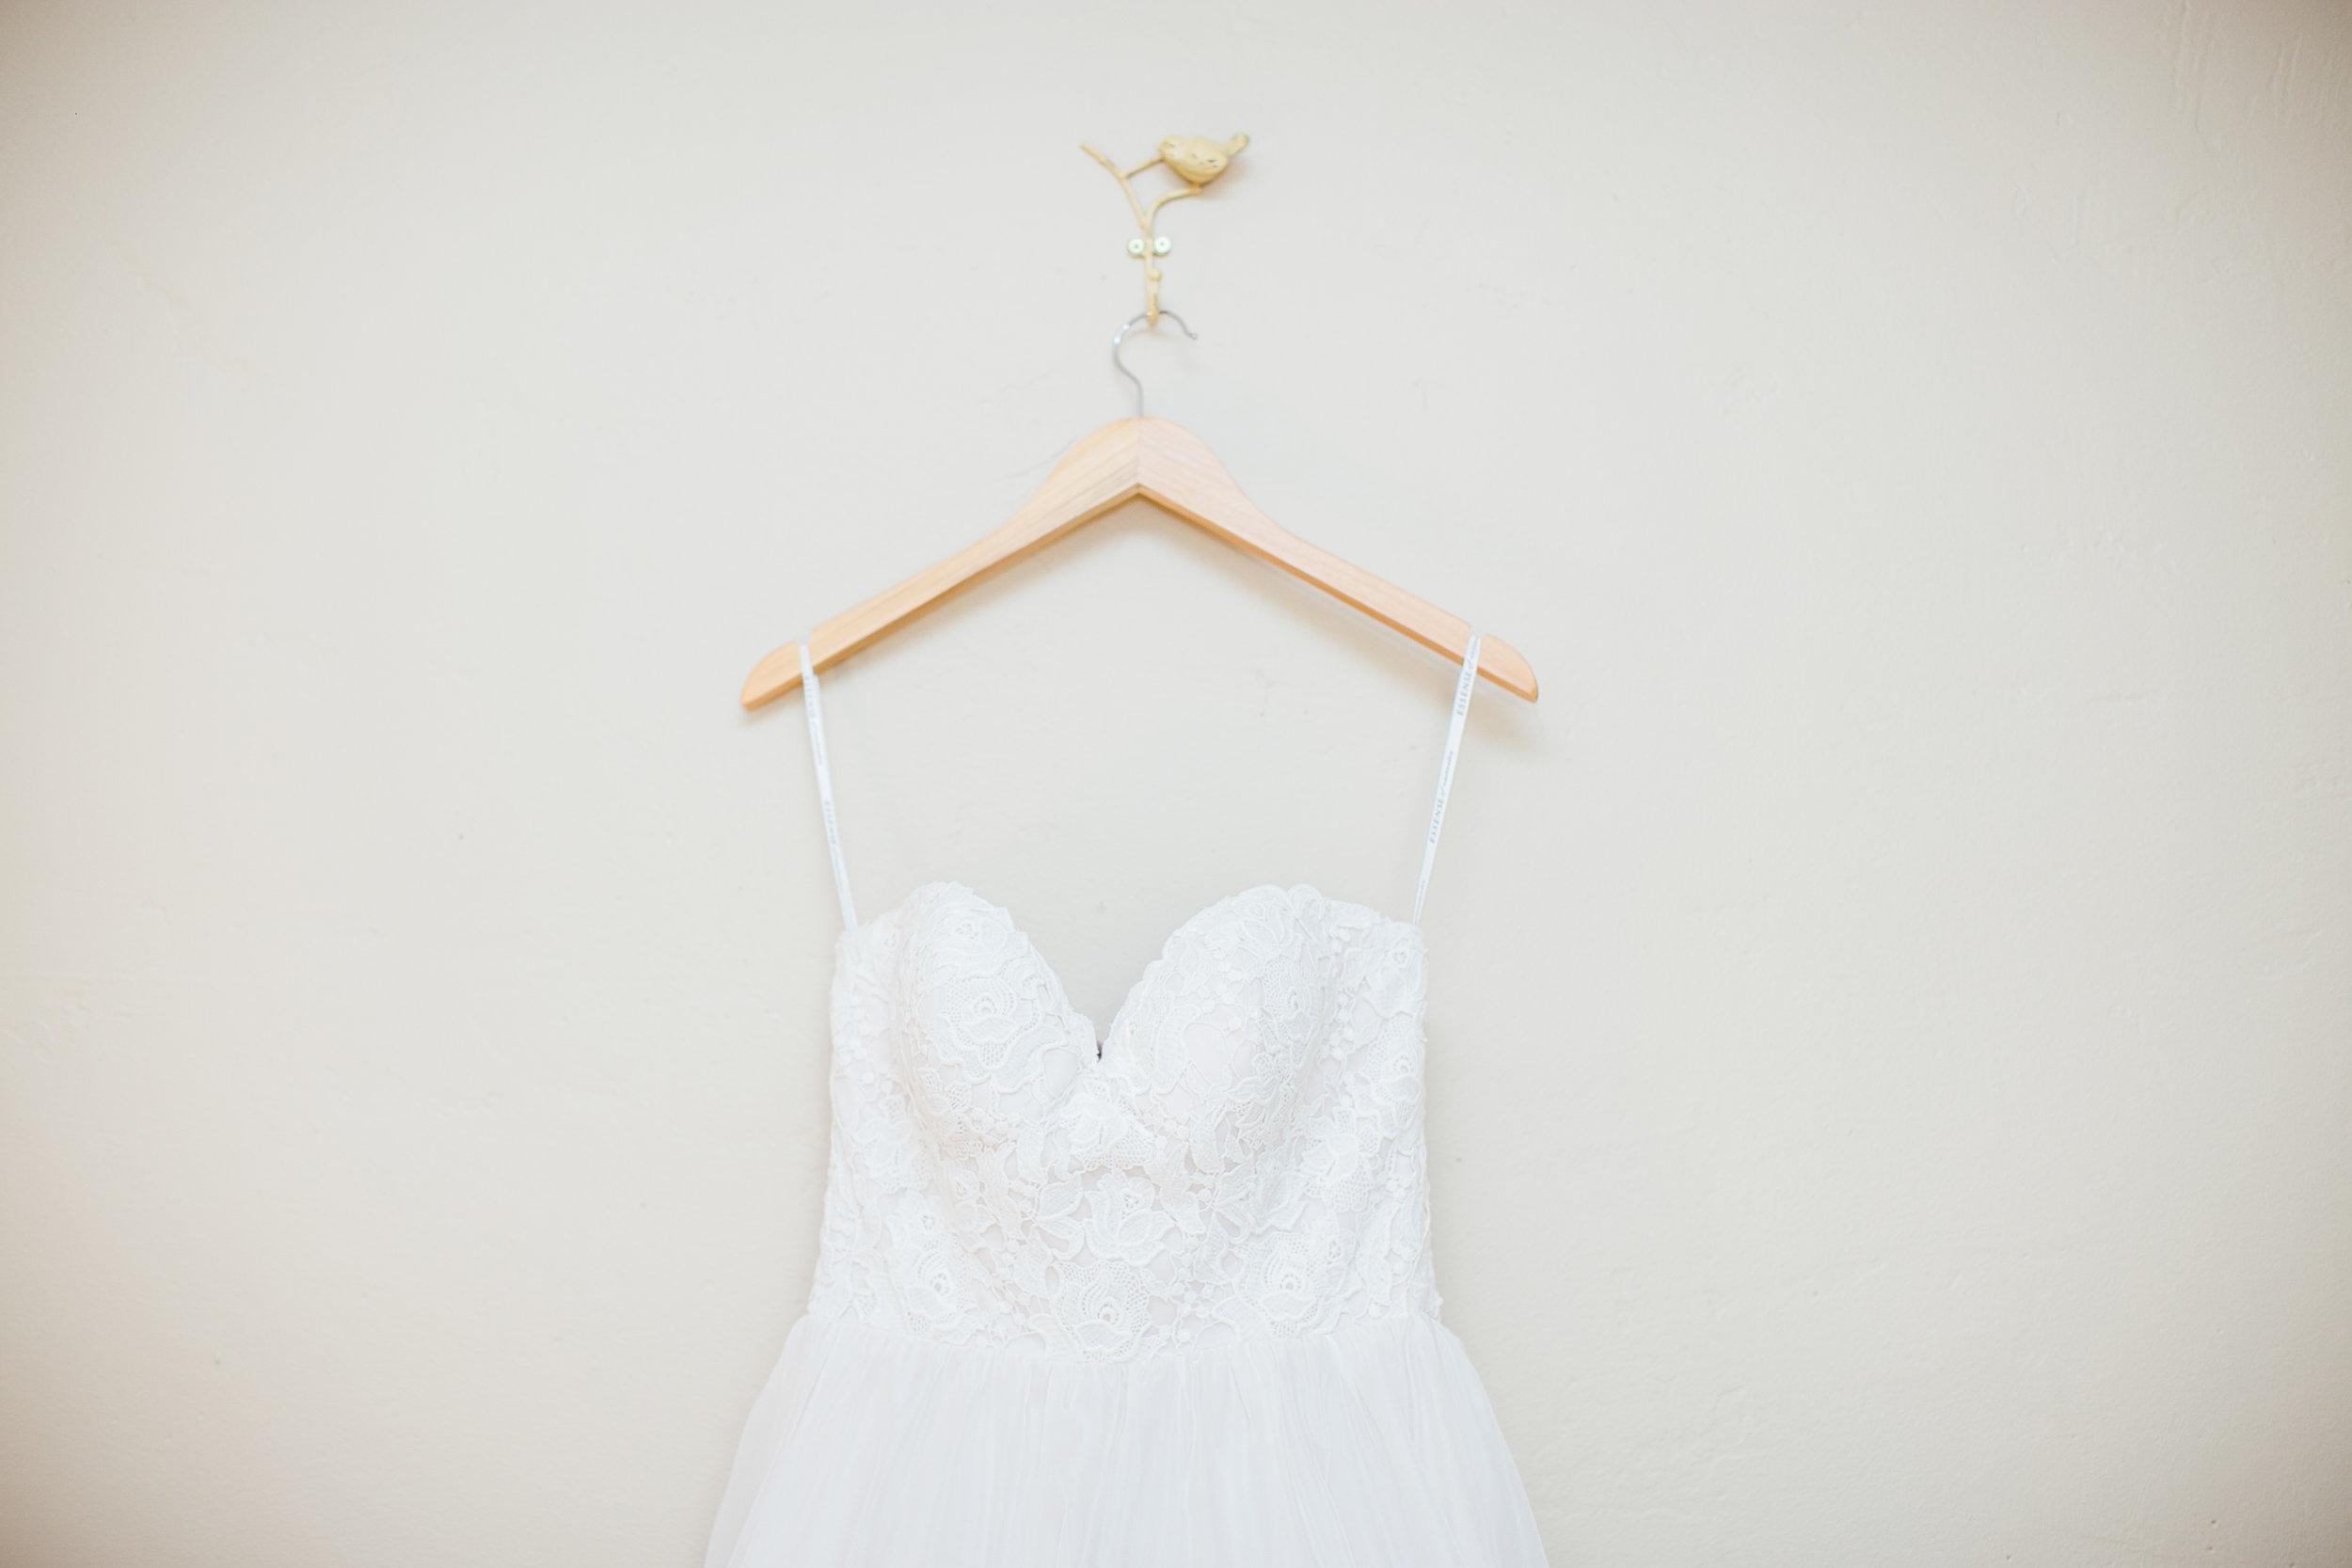 Lace Top Wedding Dress, Little Thompson Valley Pioneer Museum Berthoud Colorado Wedding